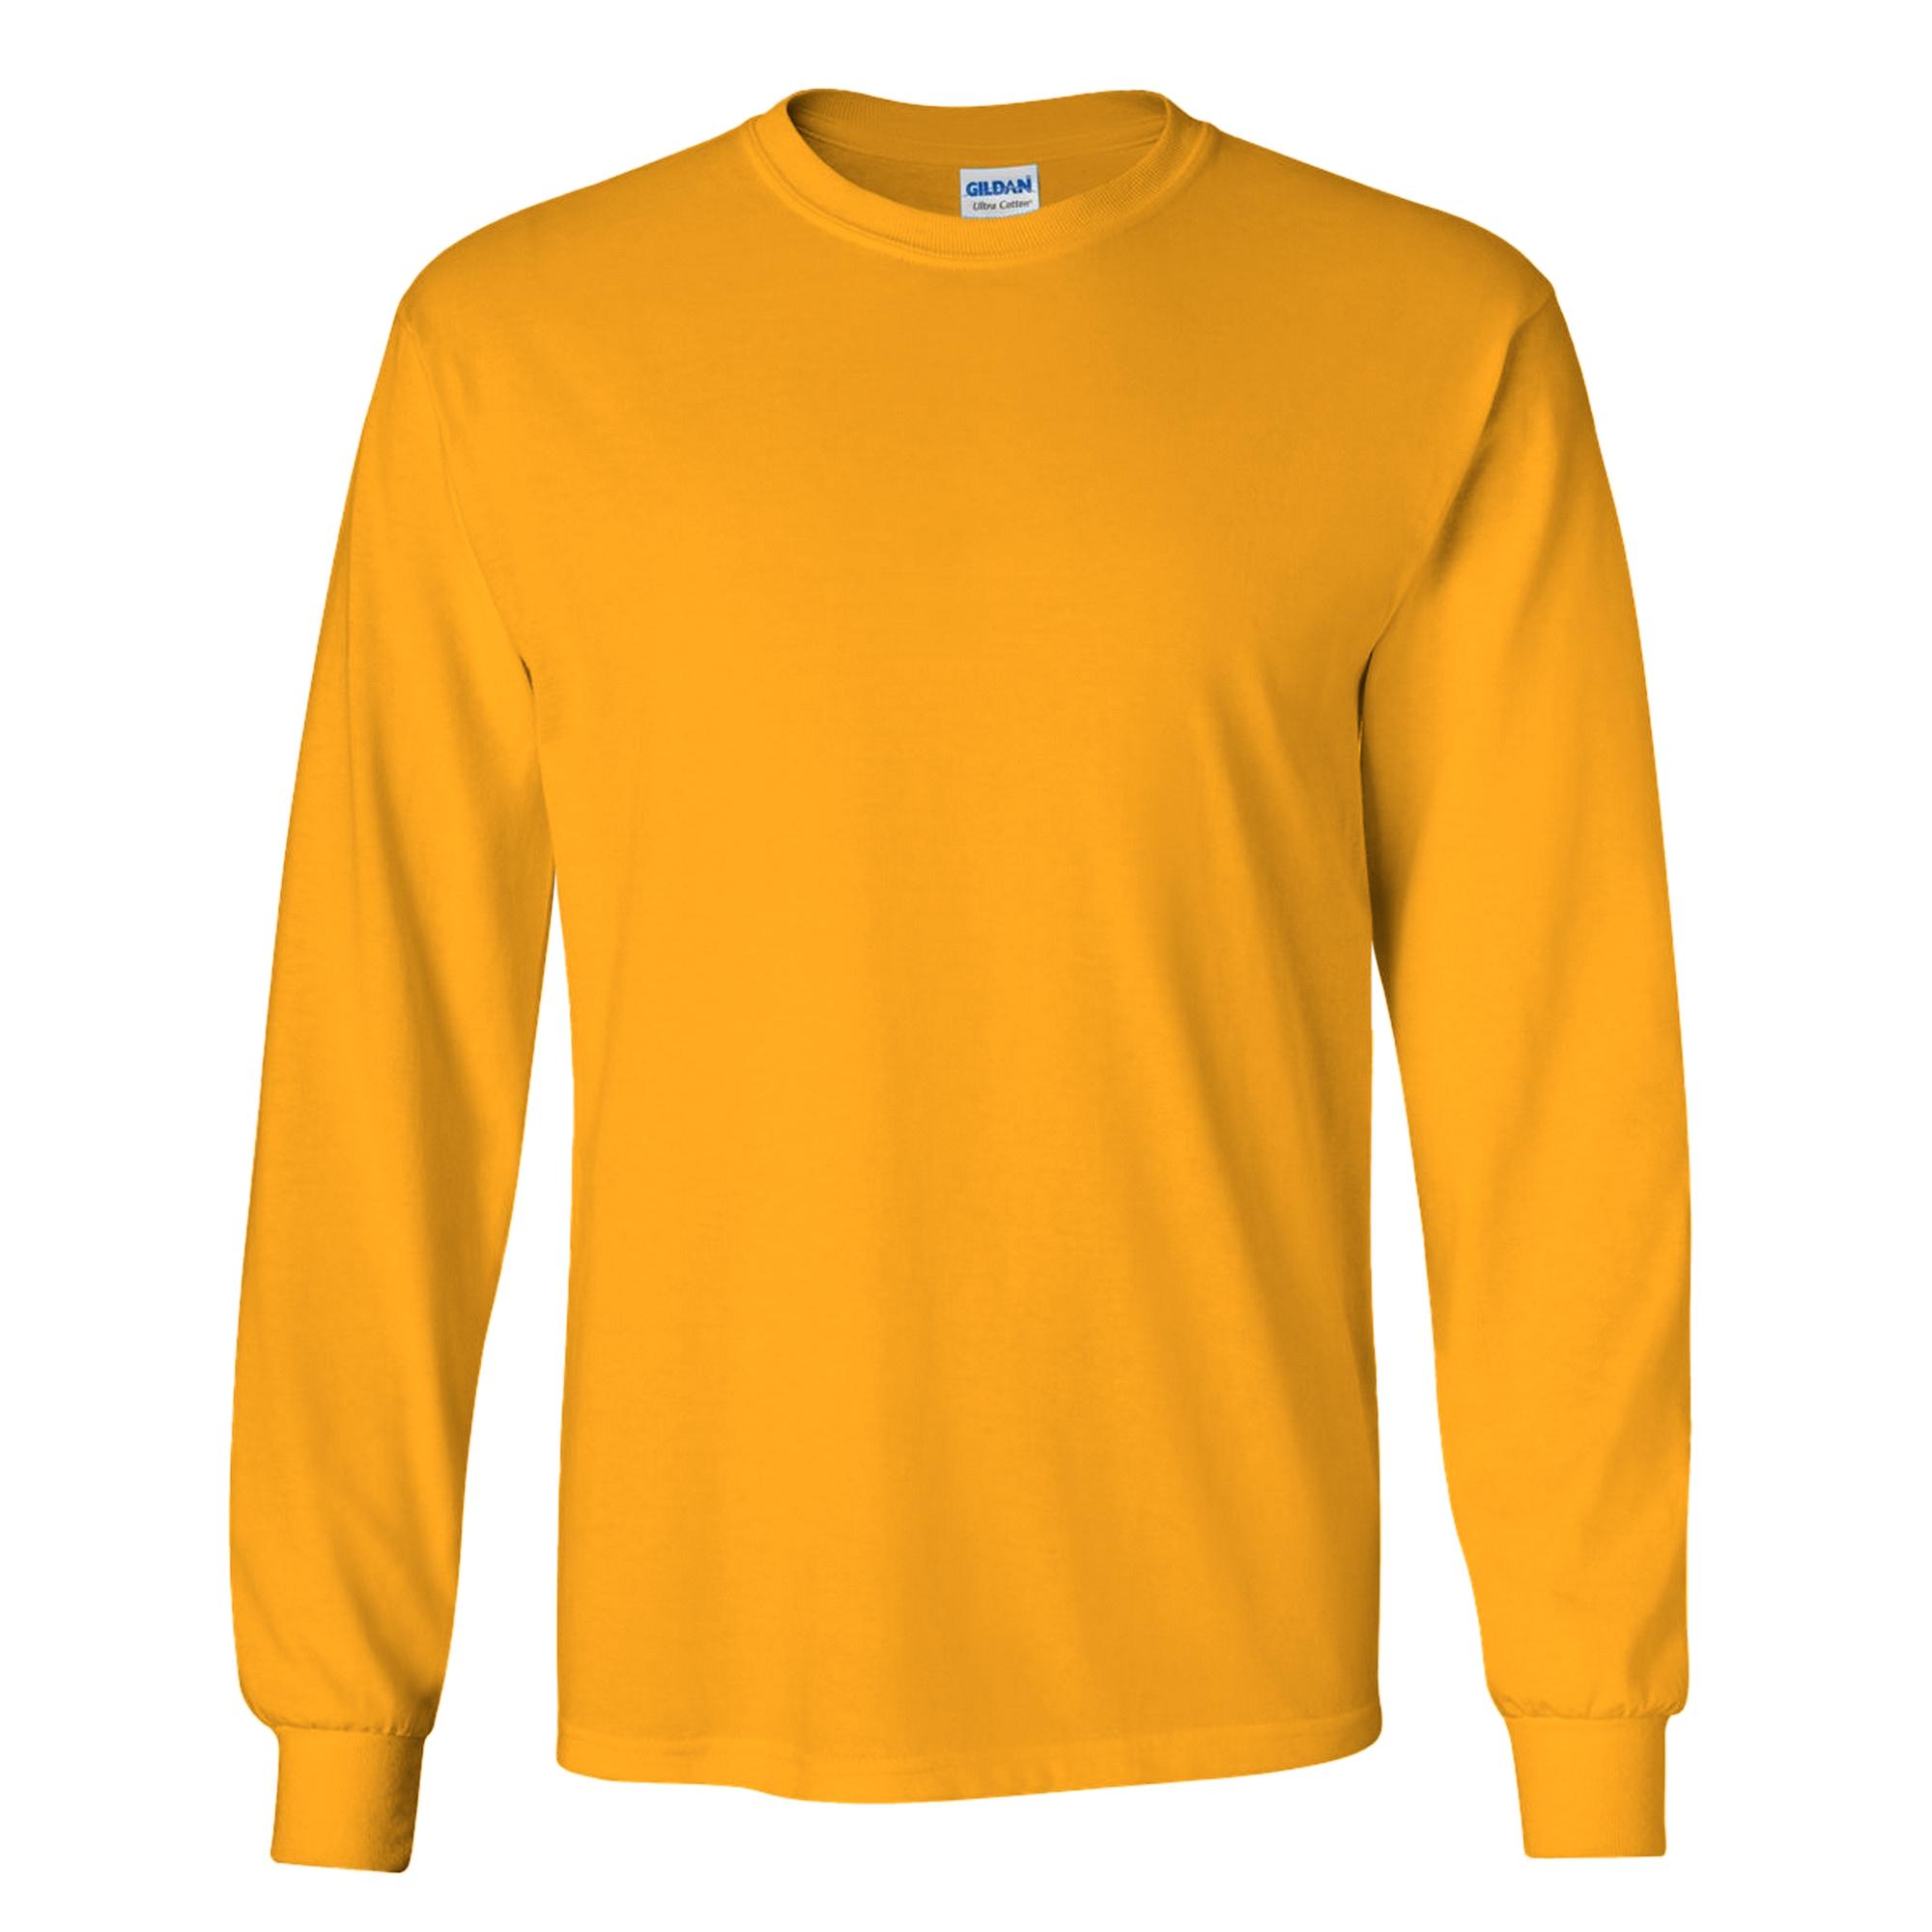 Gildan-Camiseta-basica-de-manga-larga-para-hombre-22-colores-BC477